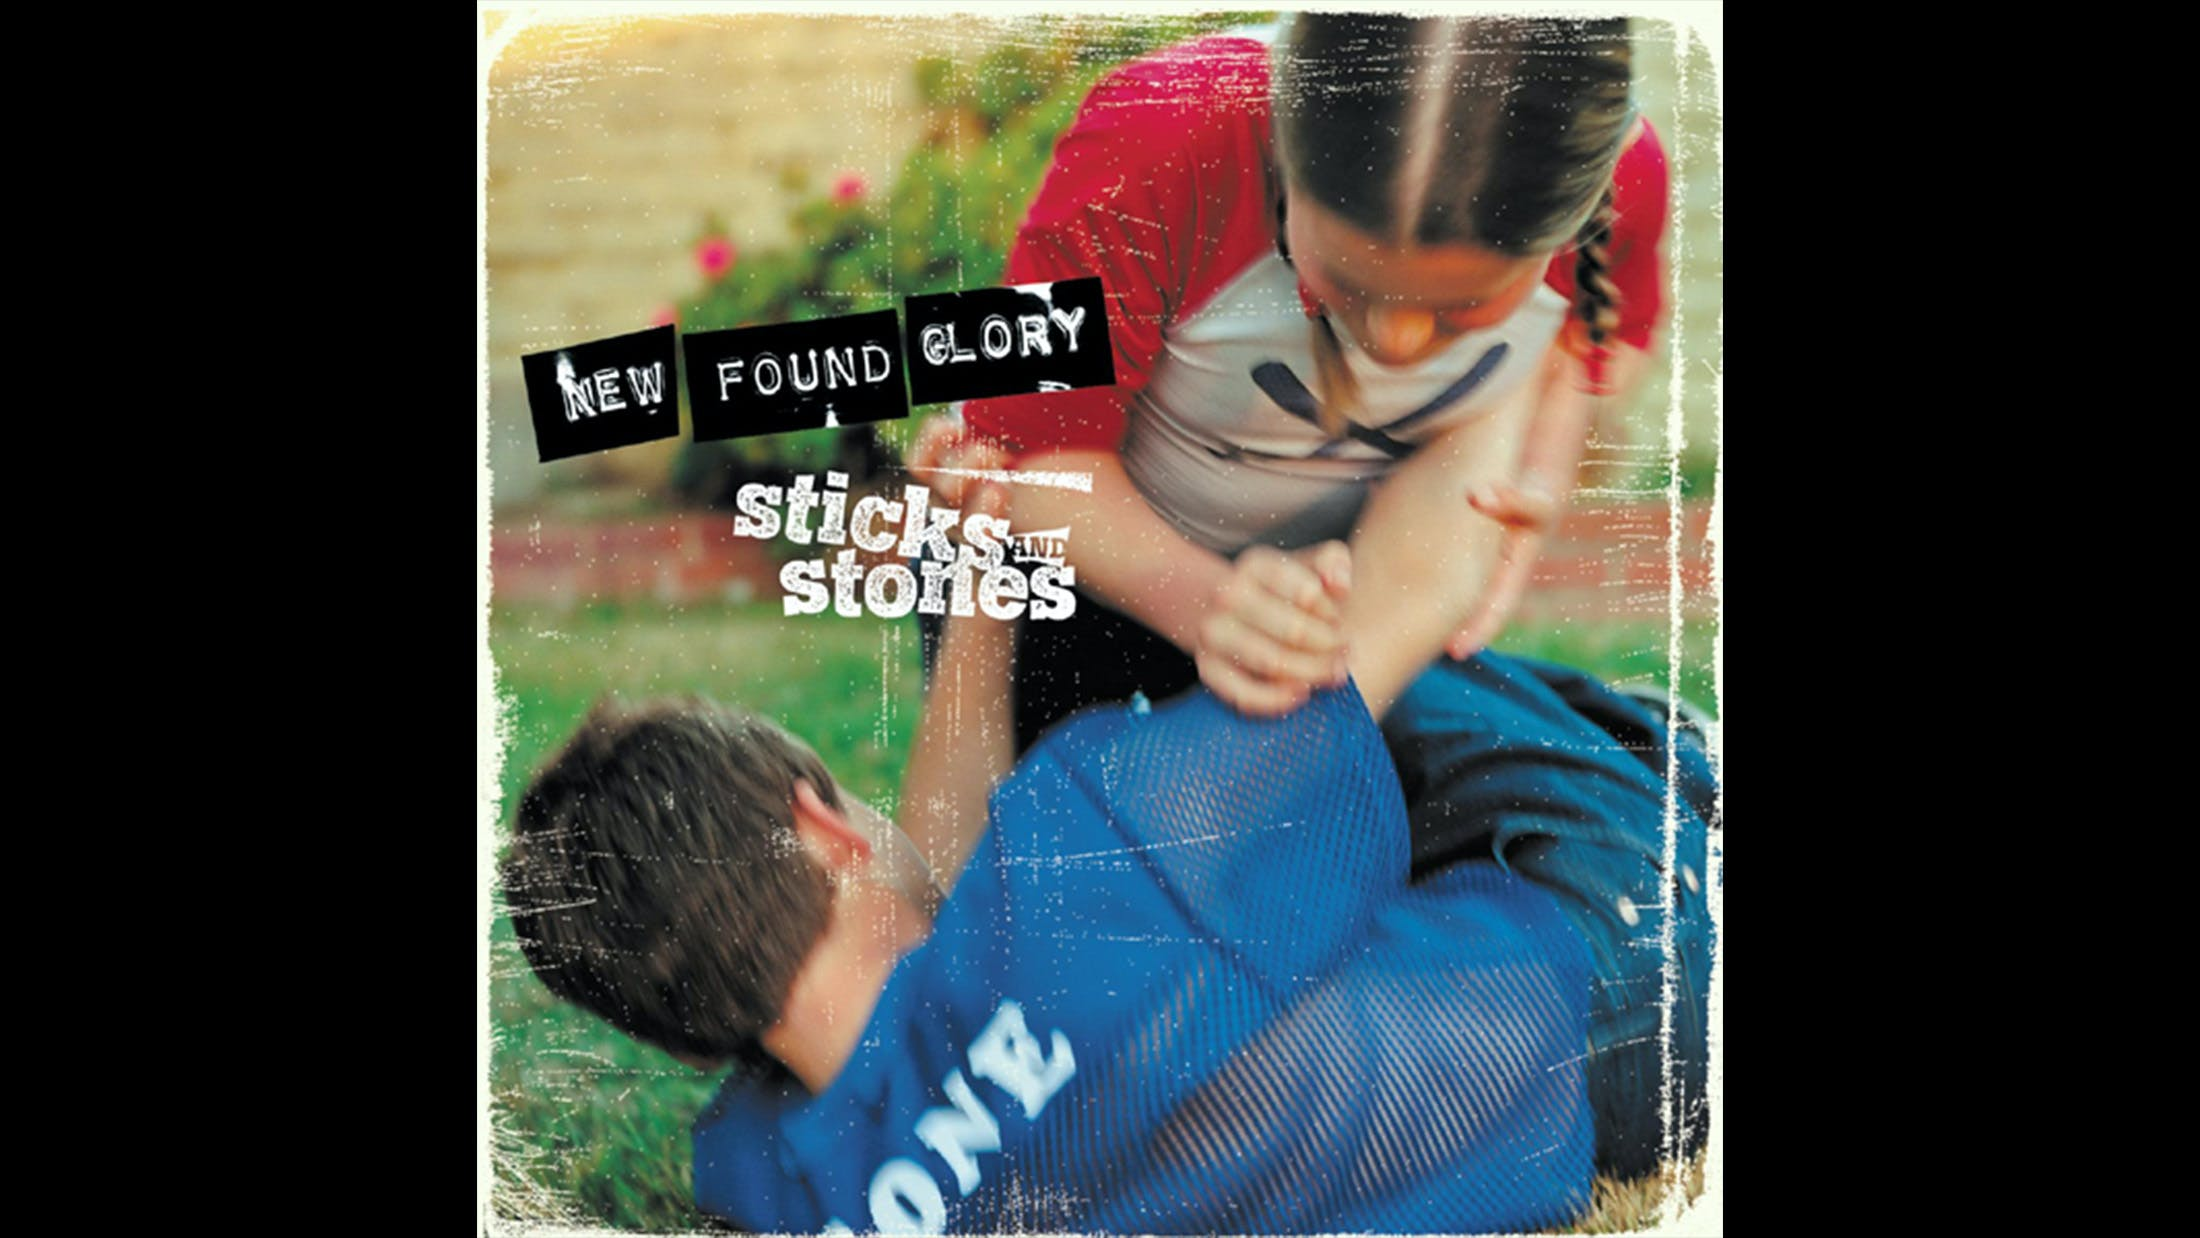 3. New Found Glory - Sticks And Stones (2002)